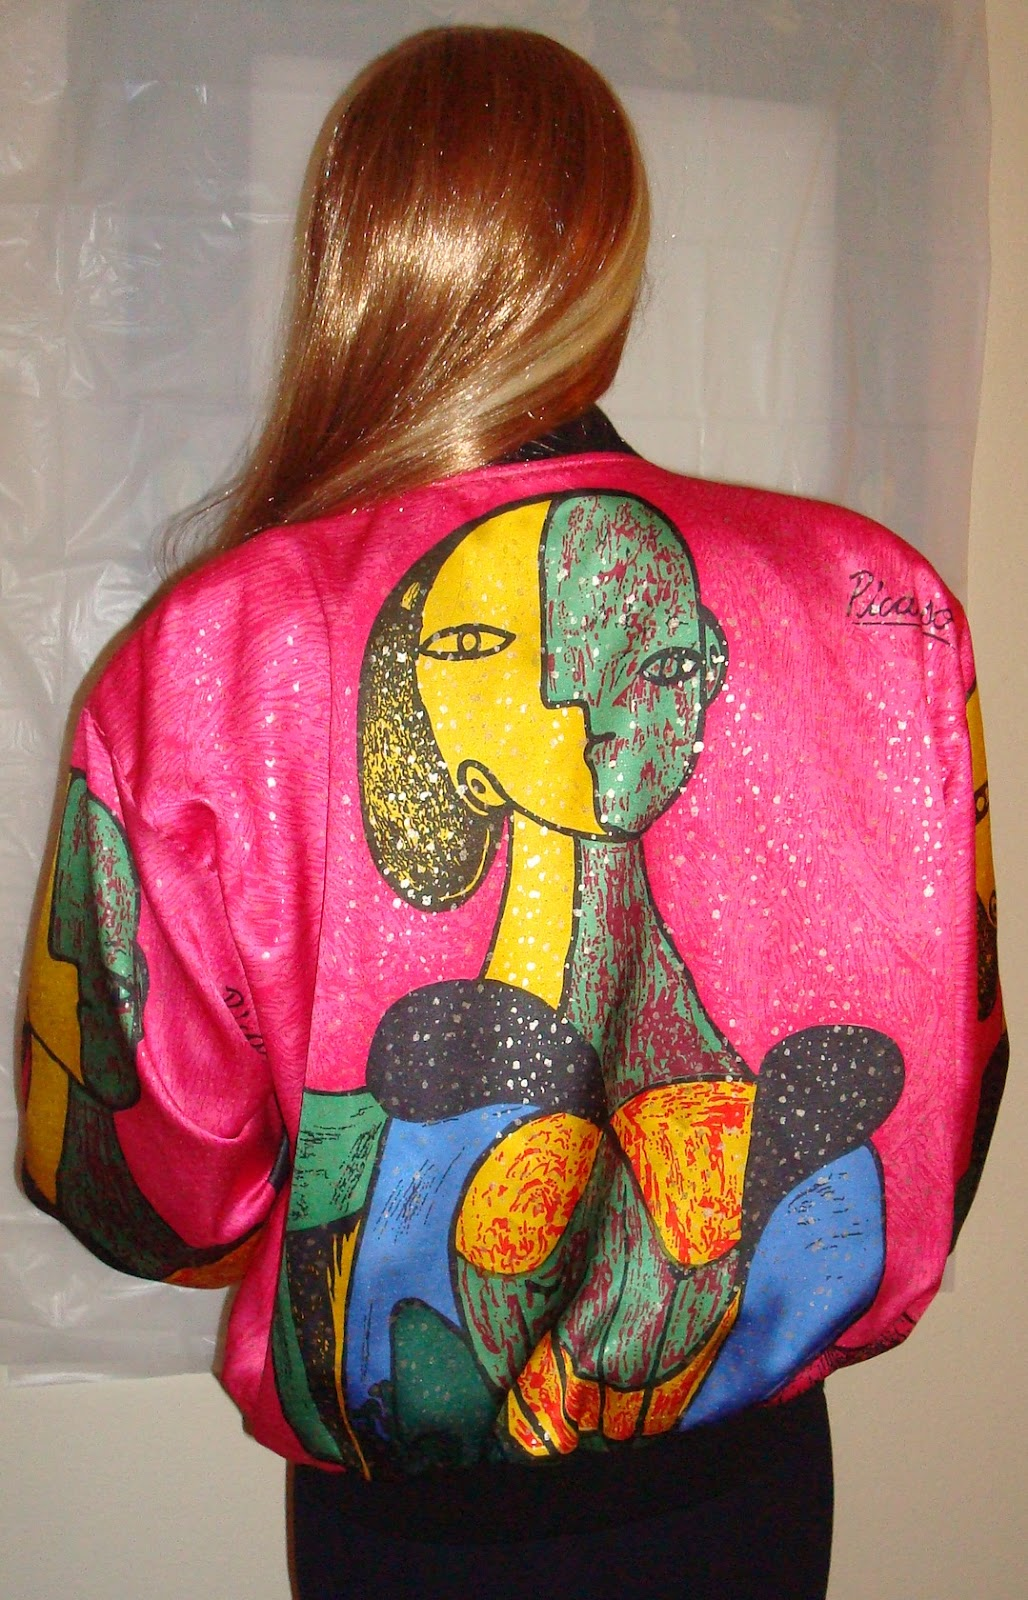 Vasilia's Vintage: Vtg 80s UGLY Neon Picasso Jacket - M-XL